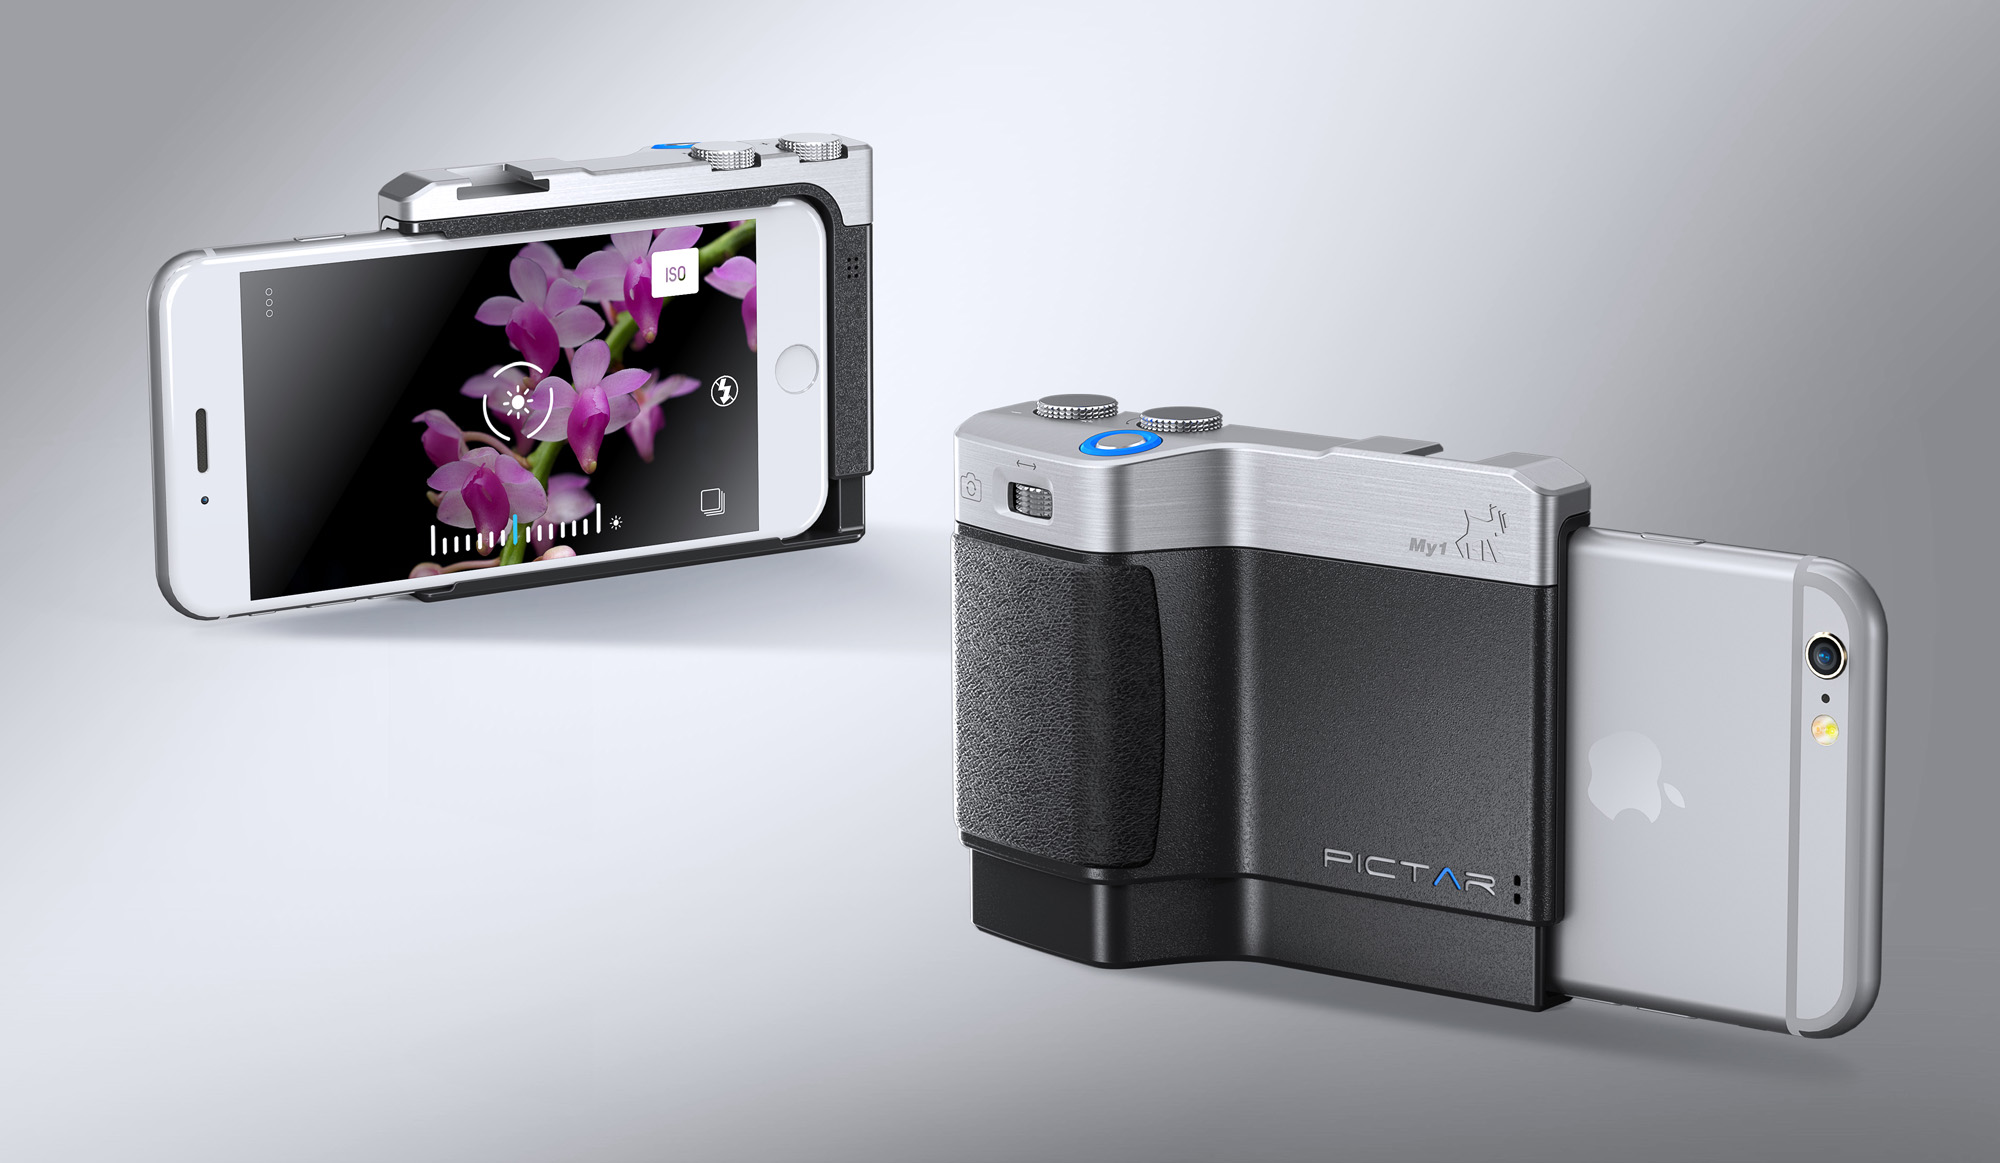 miggo-pictar-camera-grip-iphone